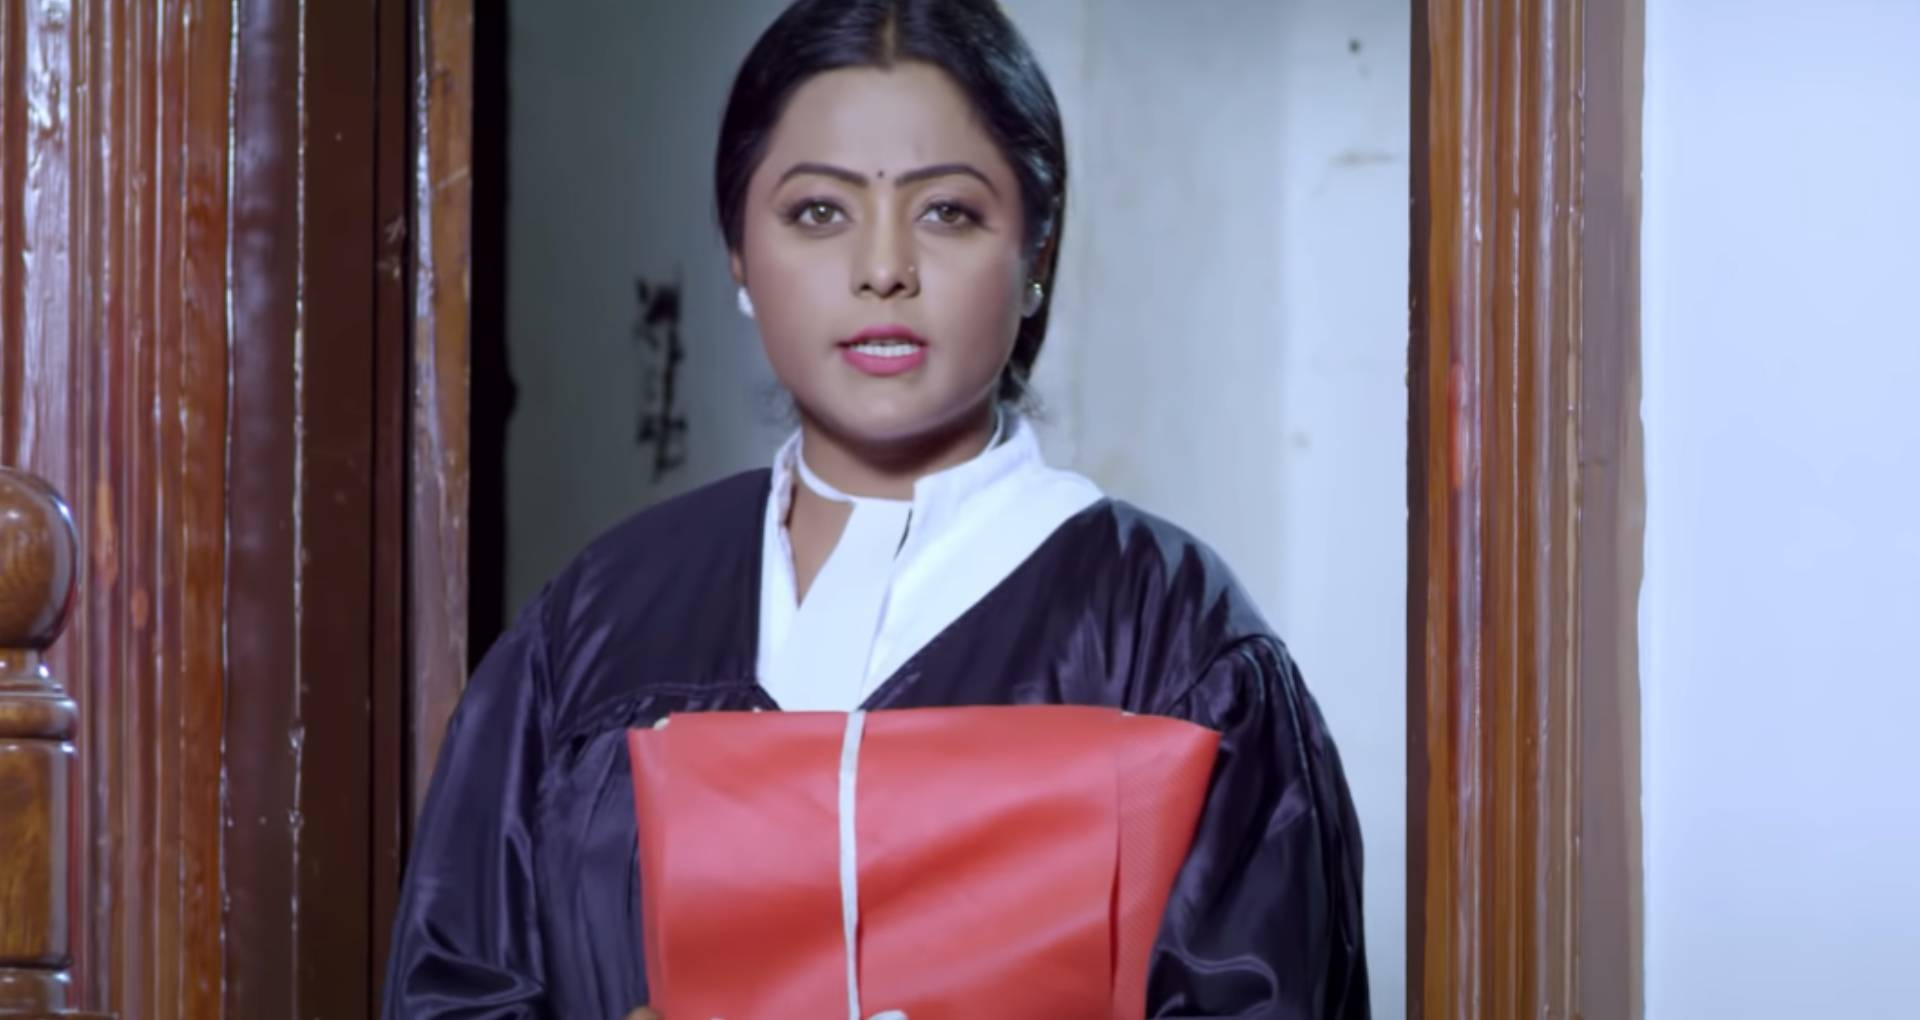 भोजपुरी फिल्म काजल का ट्रेलर रिलीज, महिला सशक्तिकरण को बढ़ावा देती दिखीं एक्ट्रेस काजल यादव